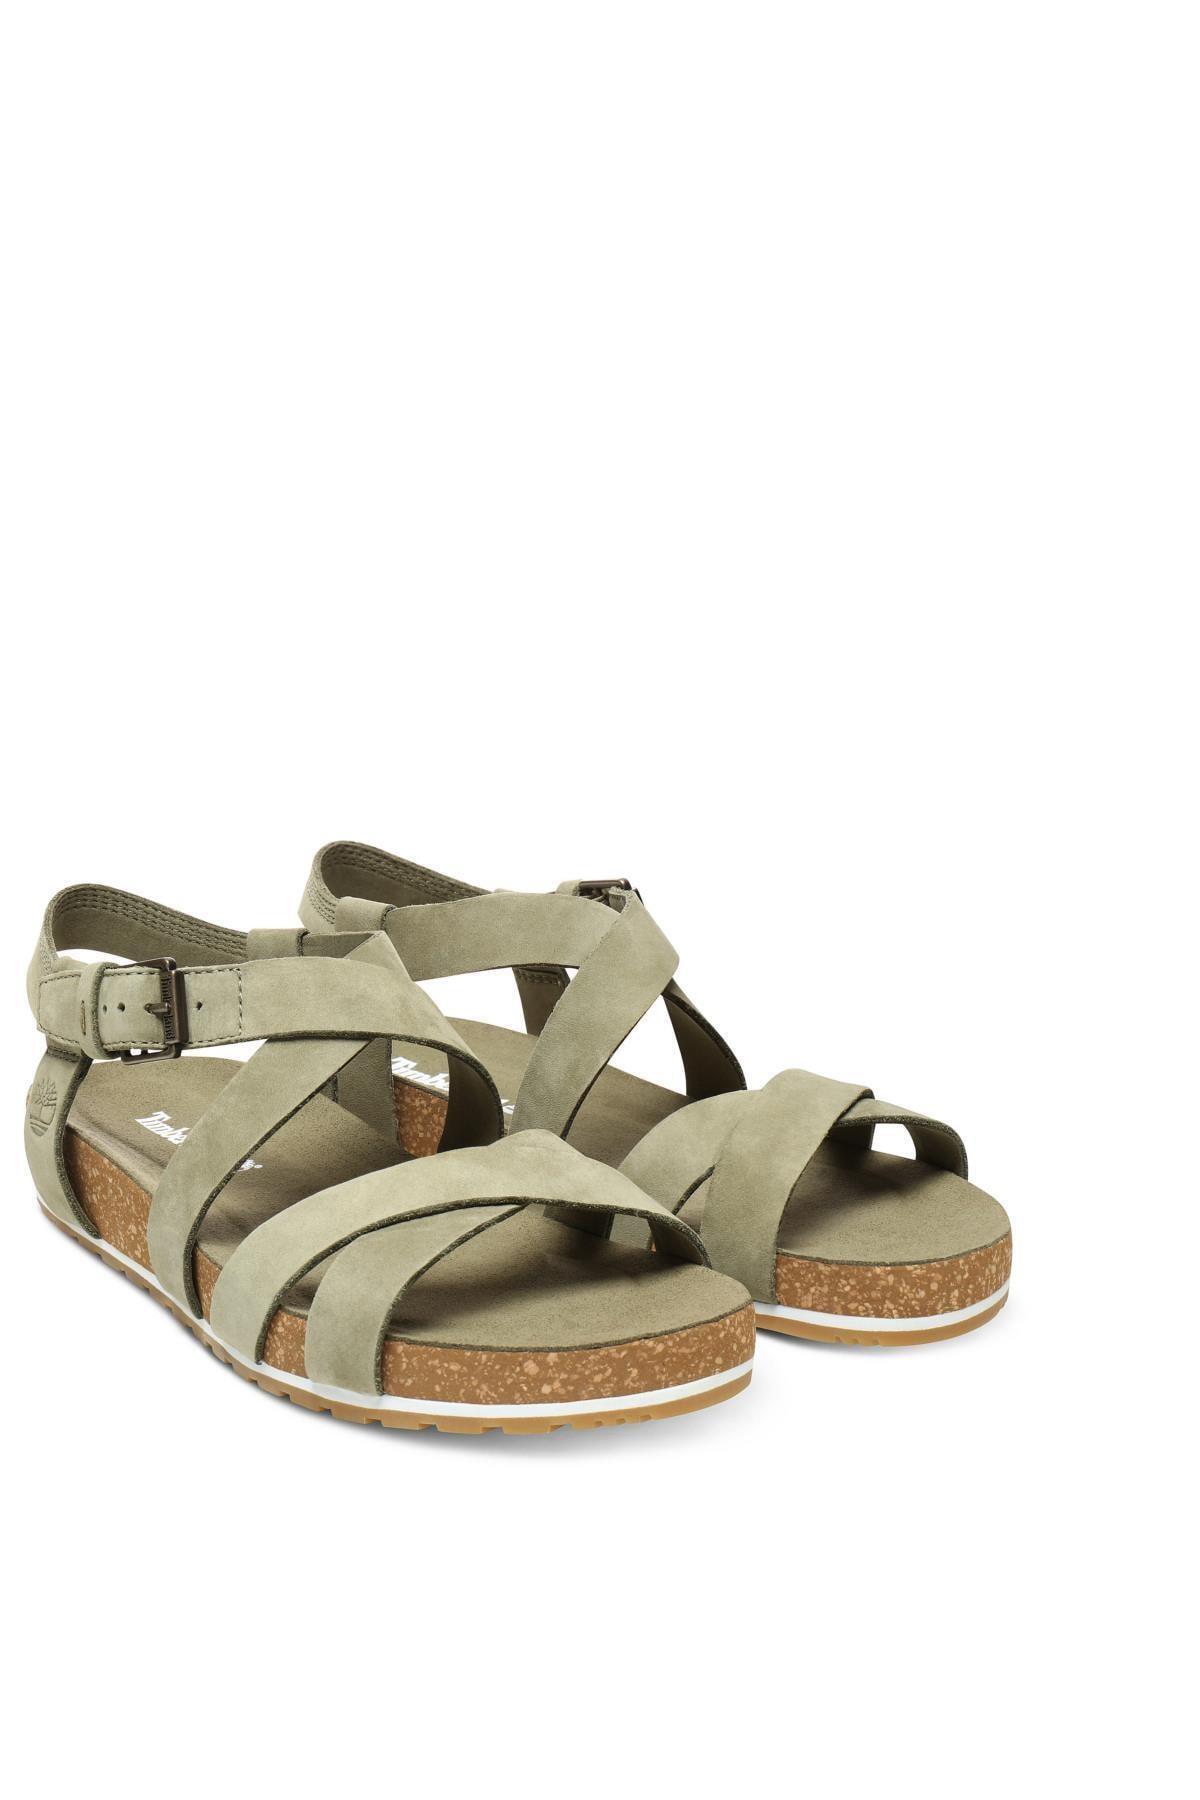 Timberland Malibu Waves Ankle Kadın Sandalet 2